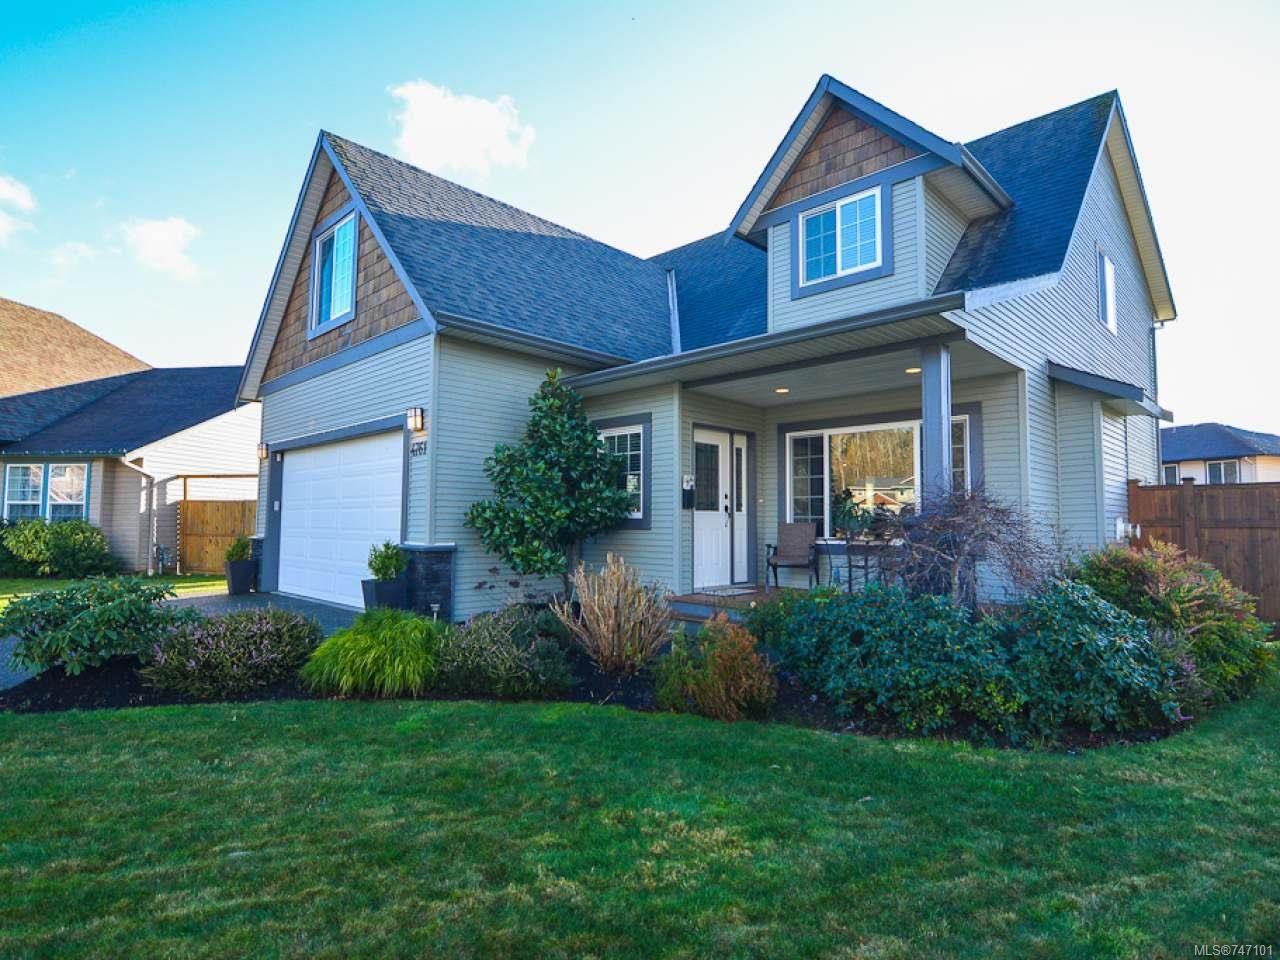 Main Photo: 4761 Cruickshank Pl in COURTENAY: CV Courtenay East House for sale (Comox Valley)  : MLS®# 747101